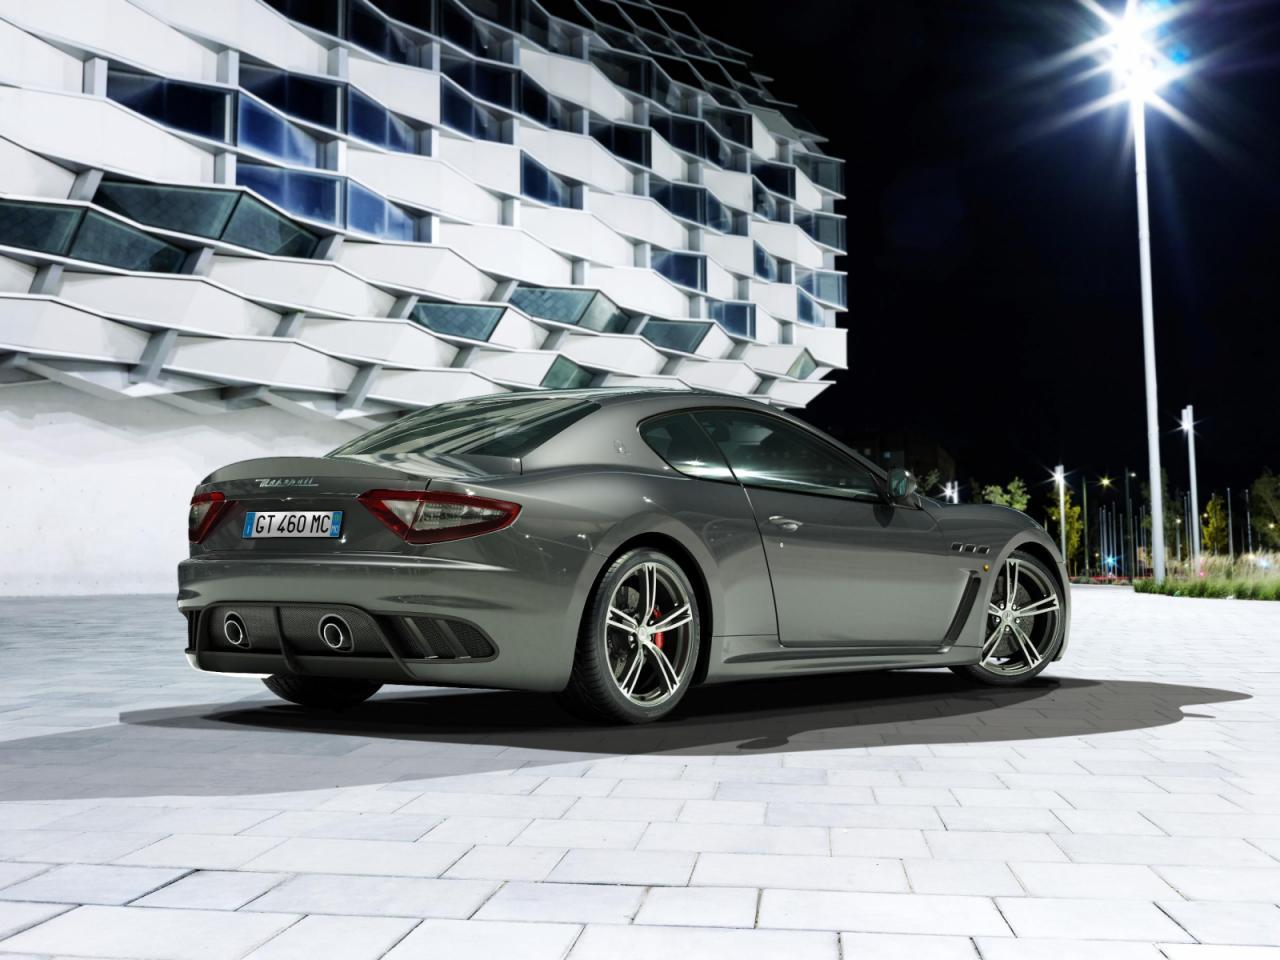 [Resim: Maserati+GranTurismo+MC+Stradale+1.jpg]